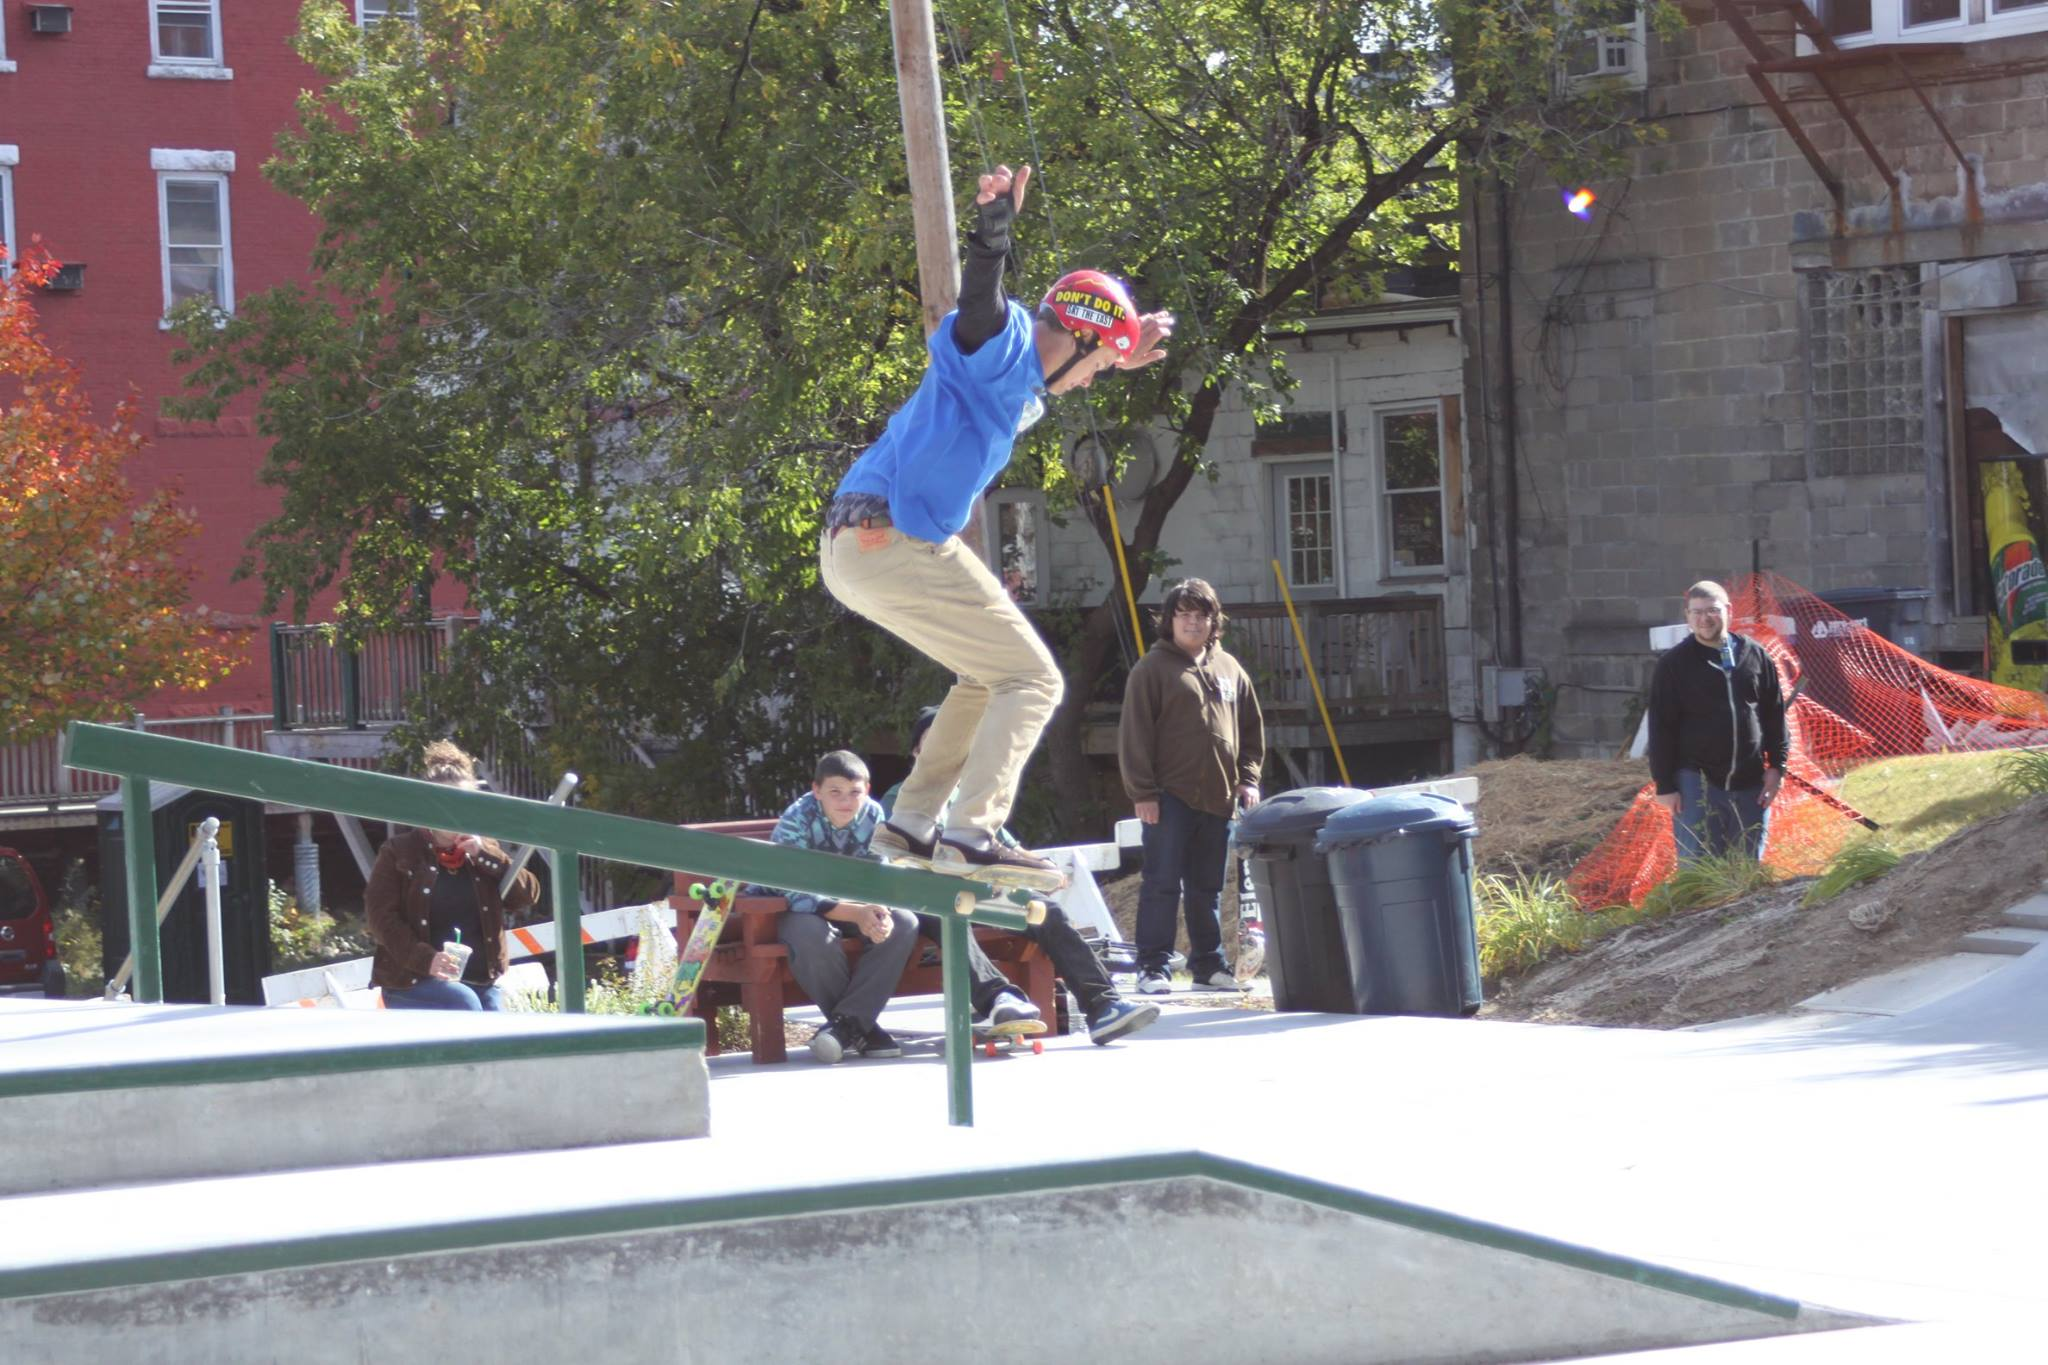 Photo Courtesy of Krooked Hills Skateshop. https://www.facebook.com/krookedhills